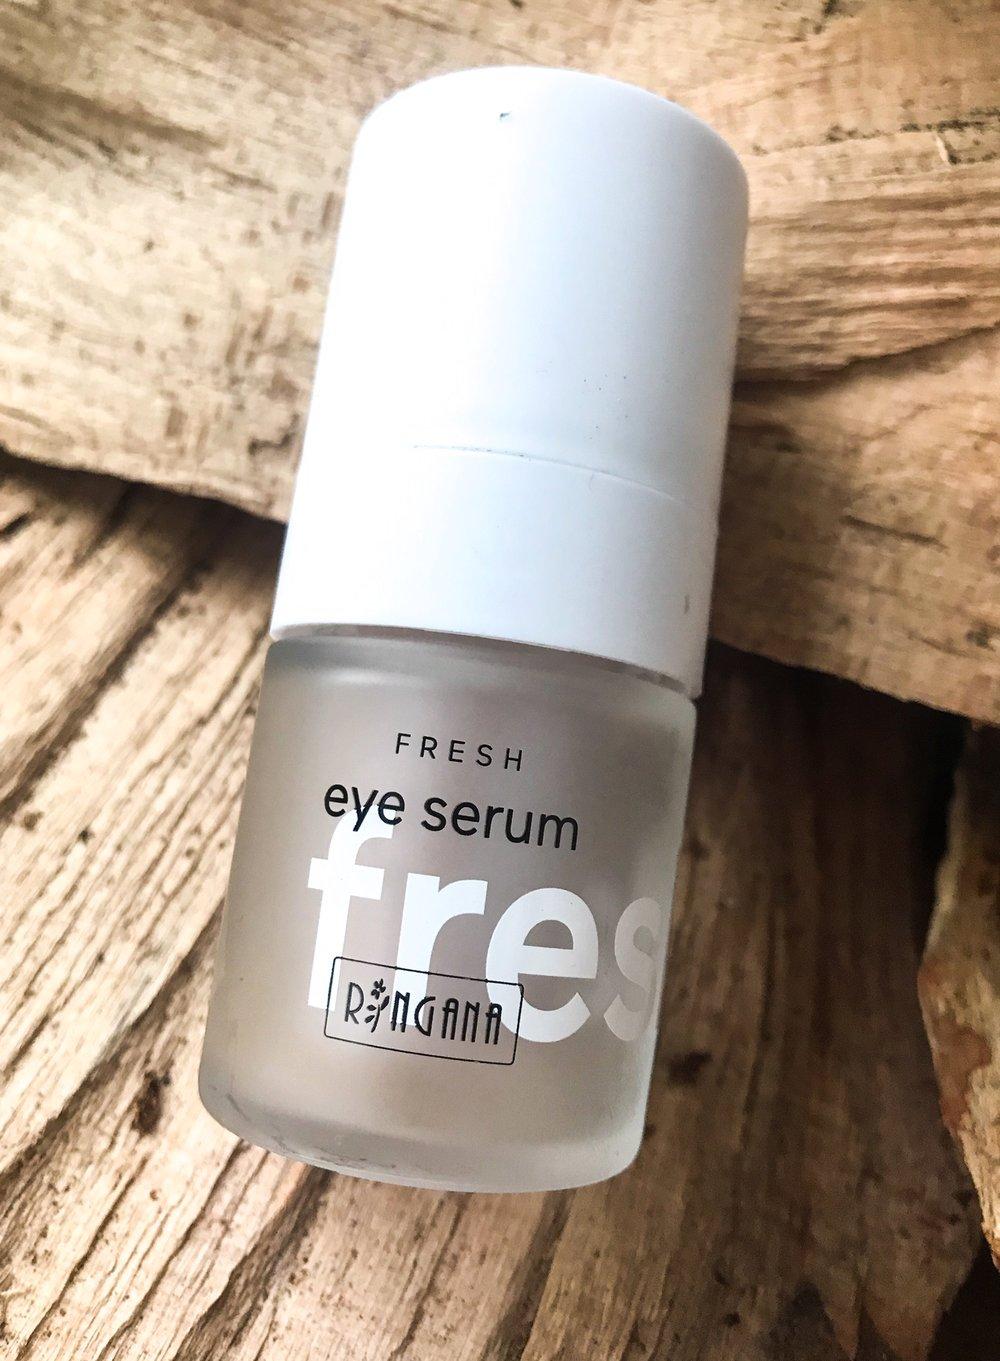 Das RINGANA FRESH eye serum - Foto by Inselamigo